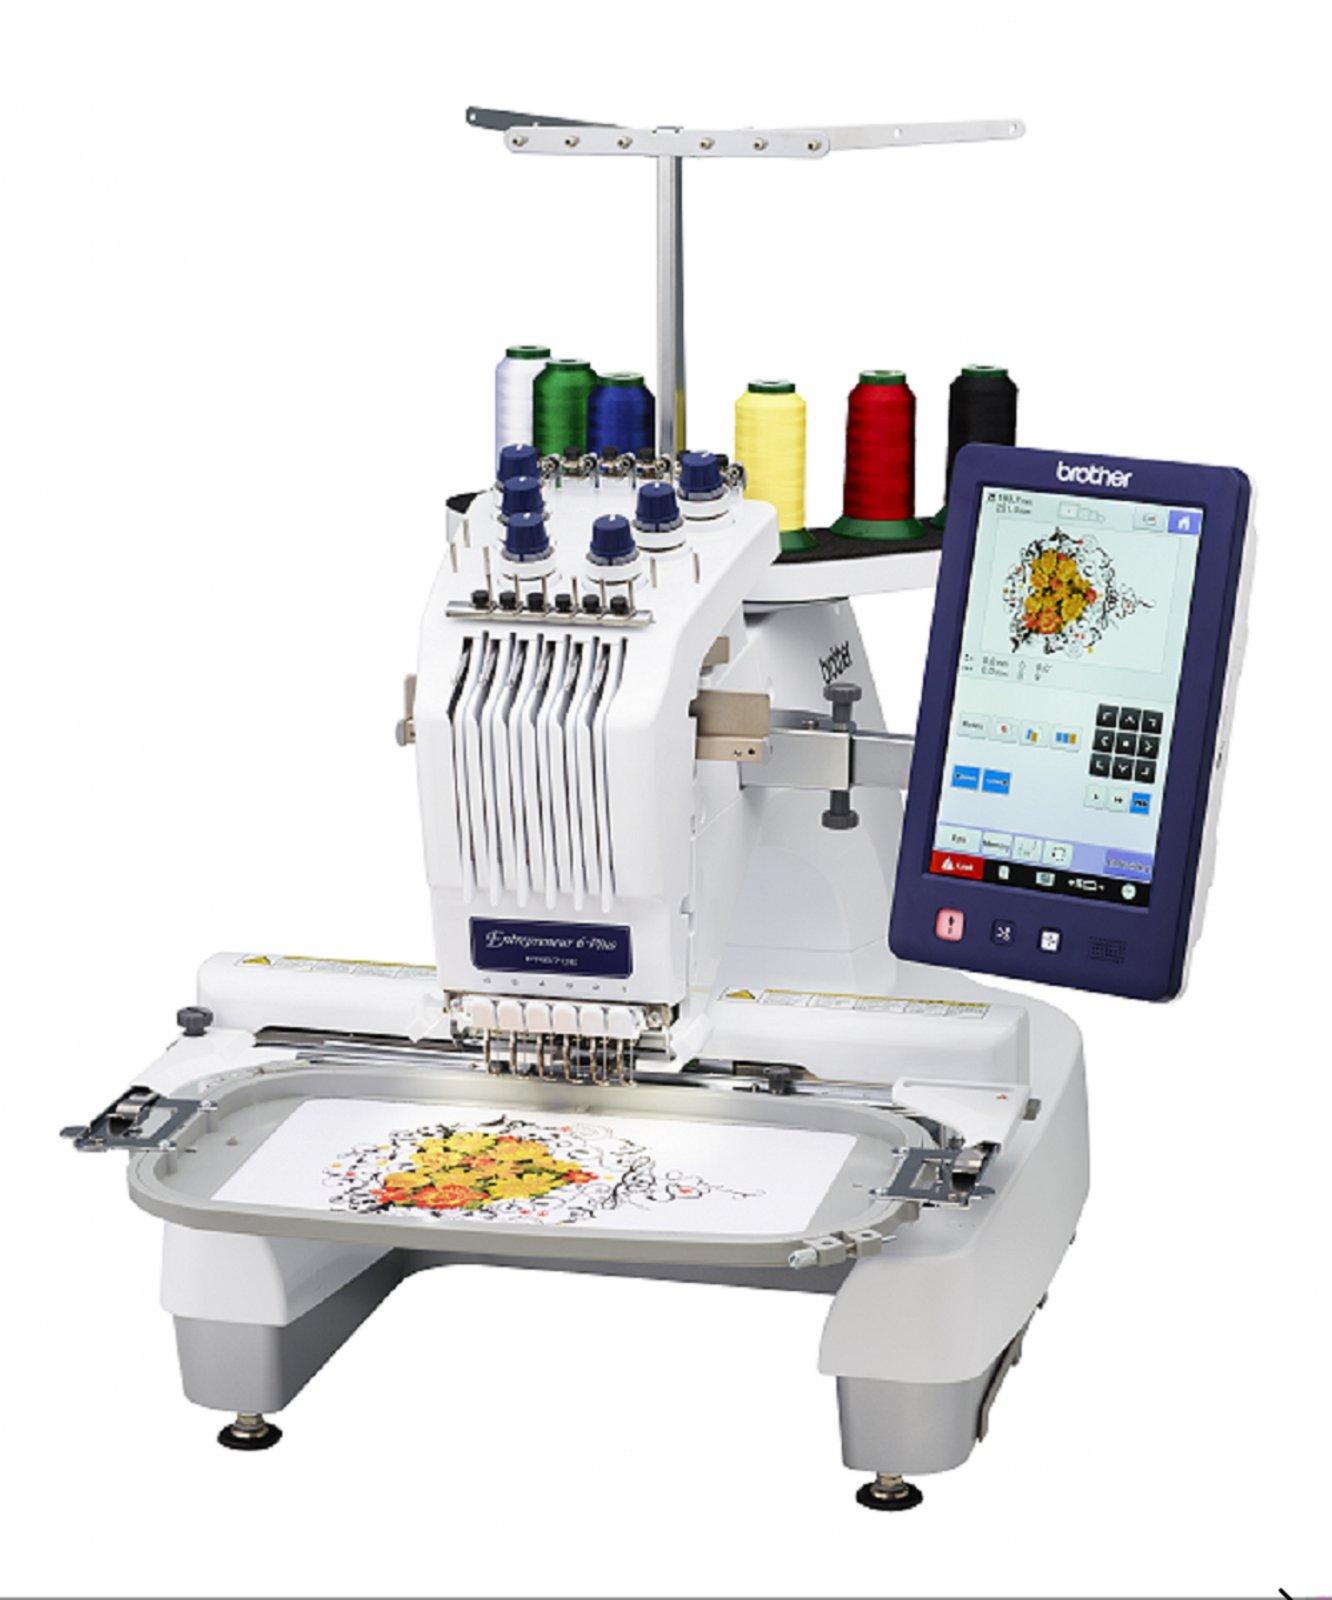 NEW PR670E SIX NEEDLE EMBROIDERY MACHINE